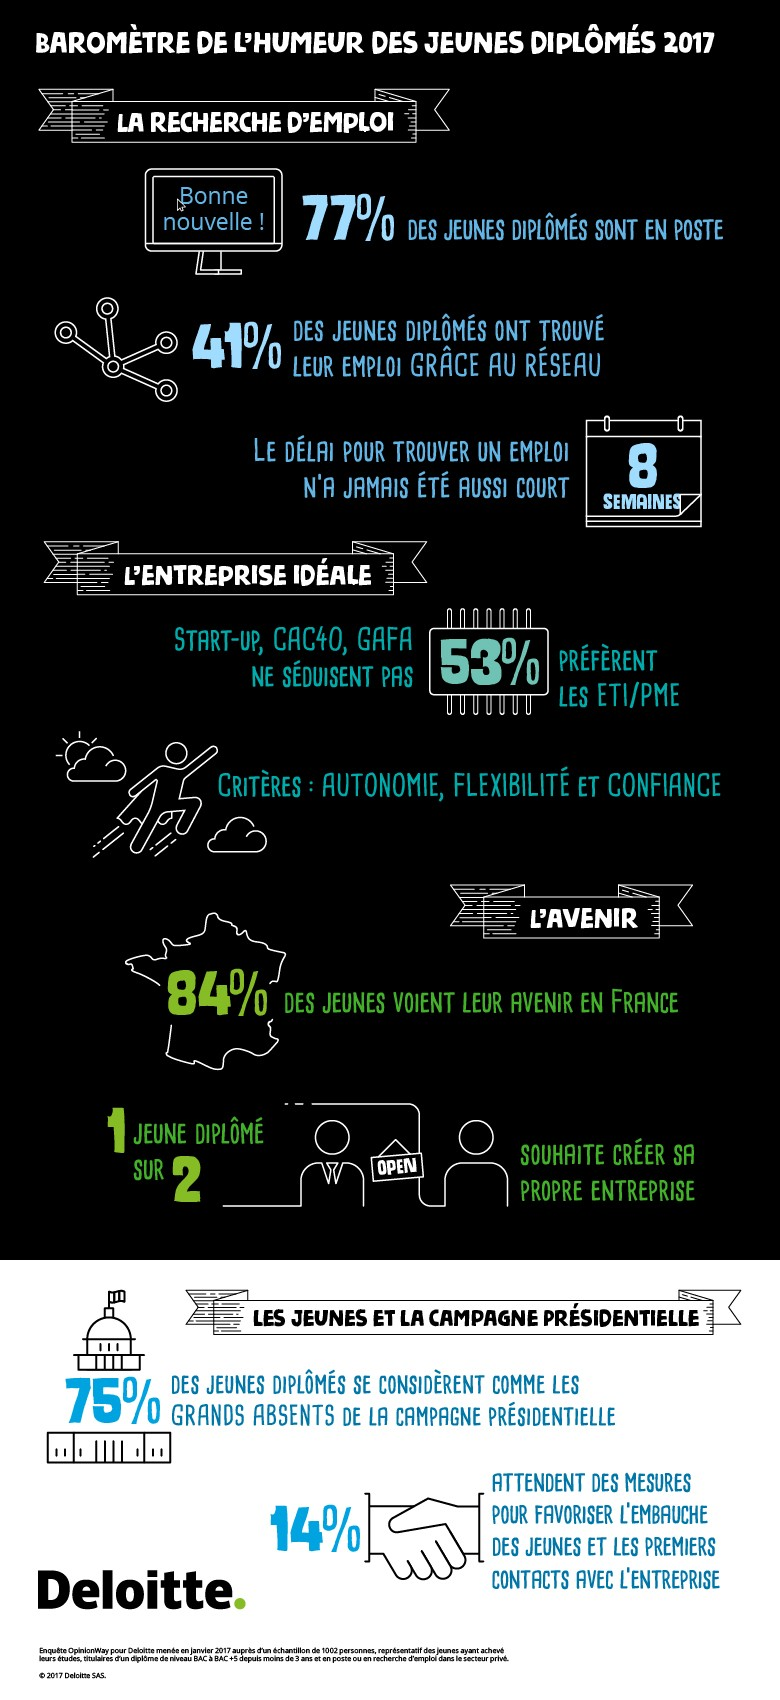 infographie Barometre JD Deloitte 2017